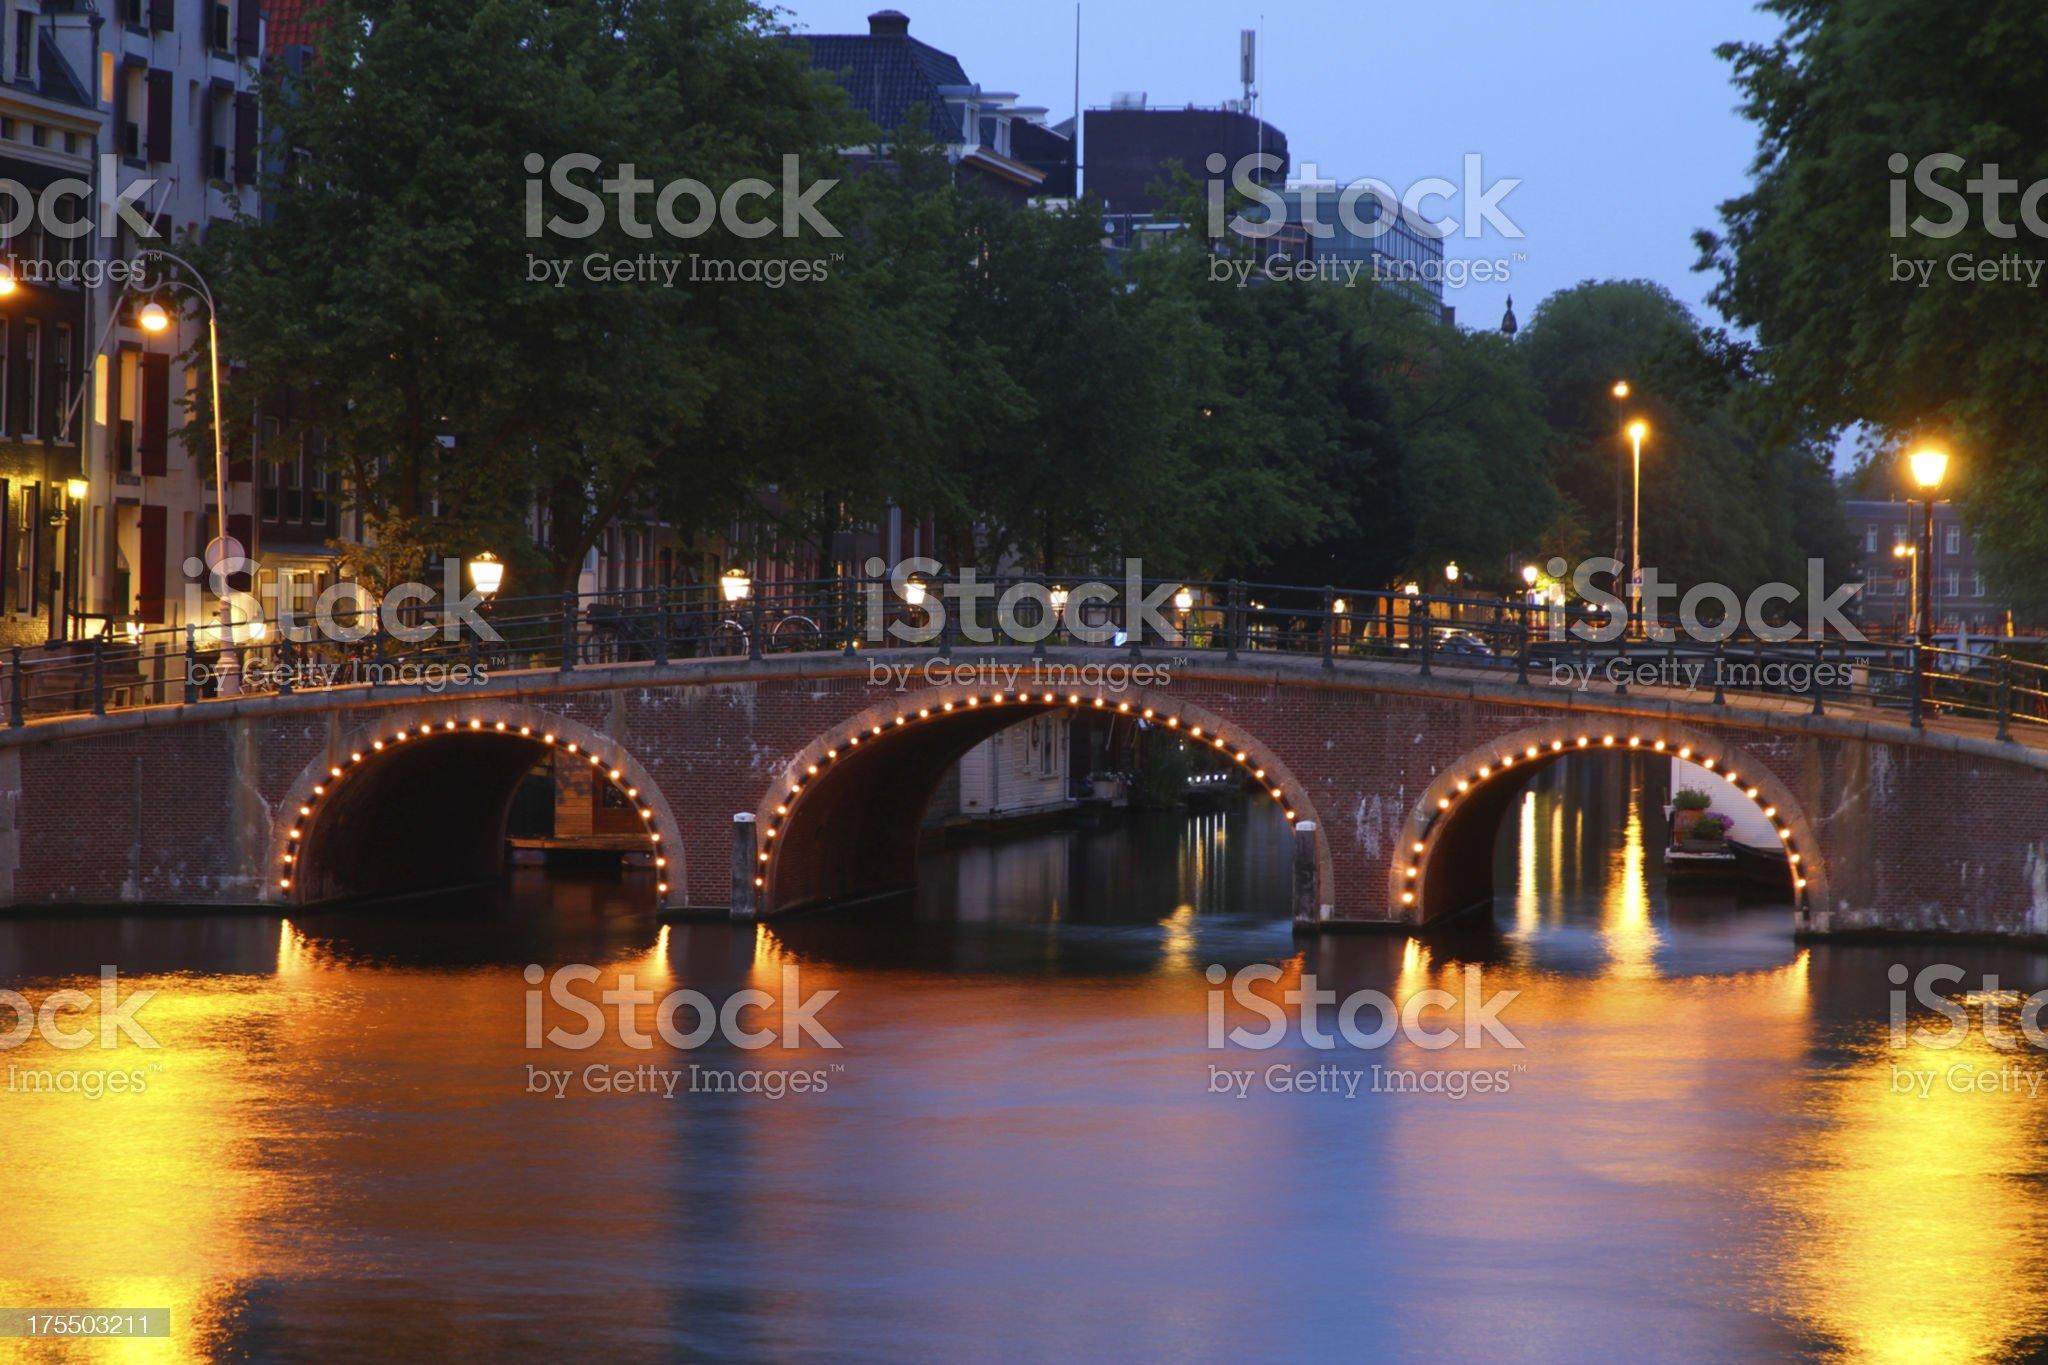 Amsterdam Bridges royalty-free stock photo